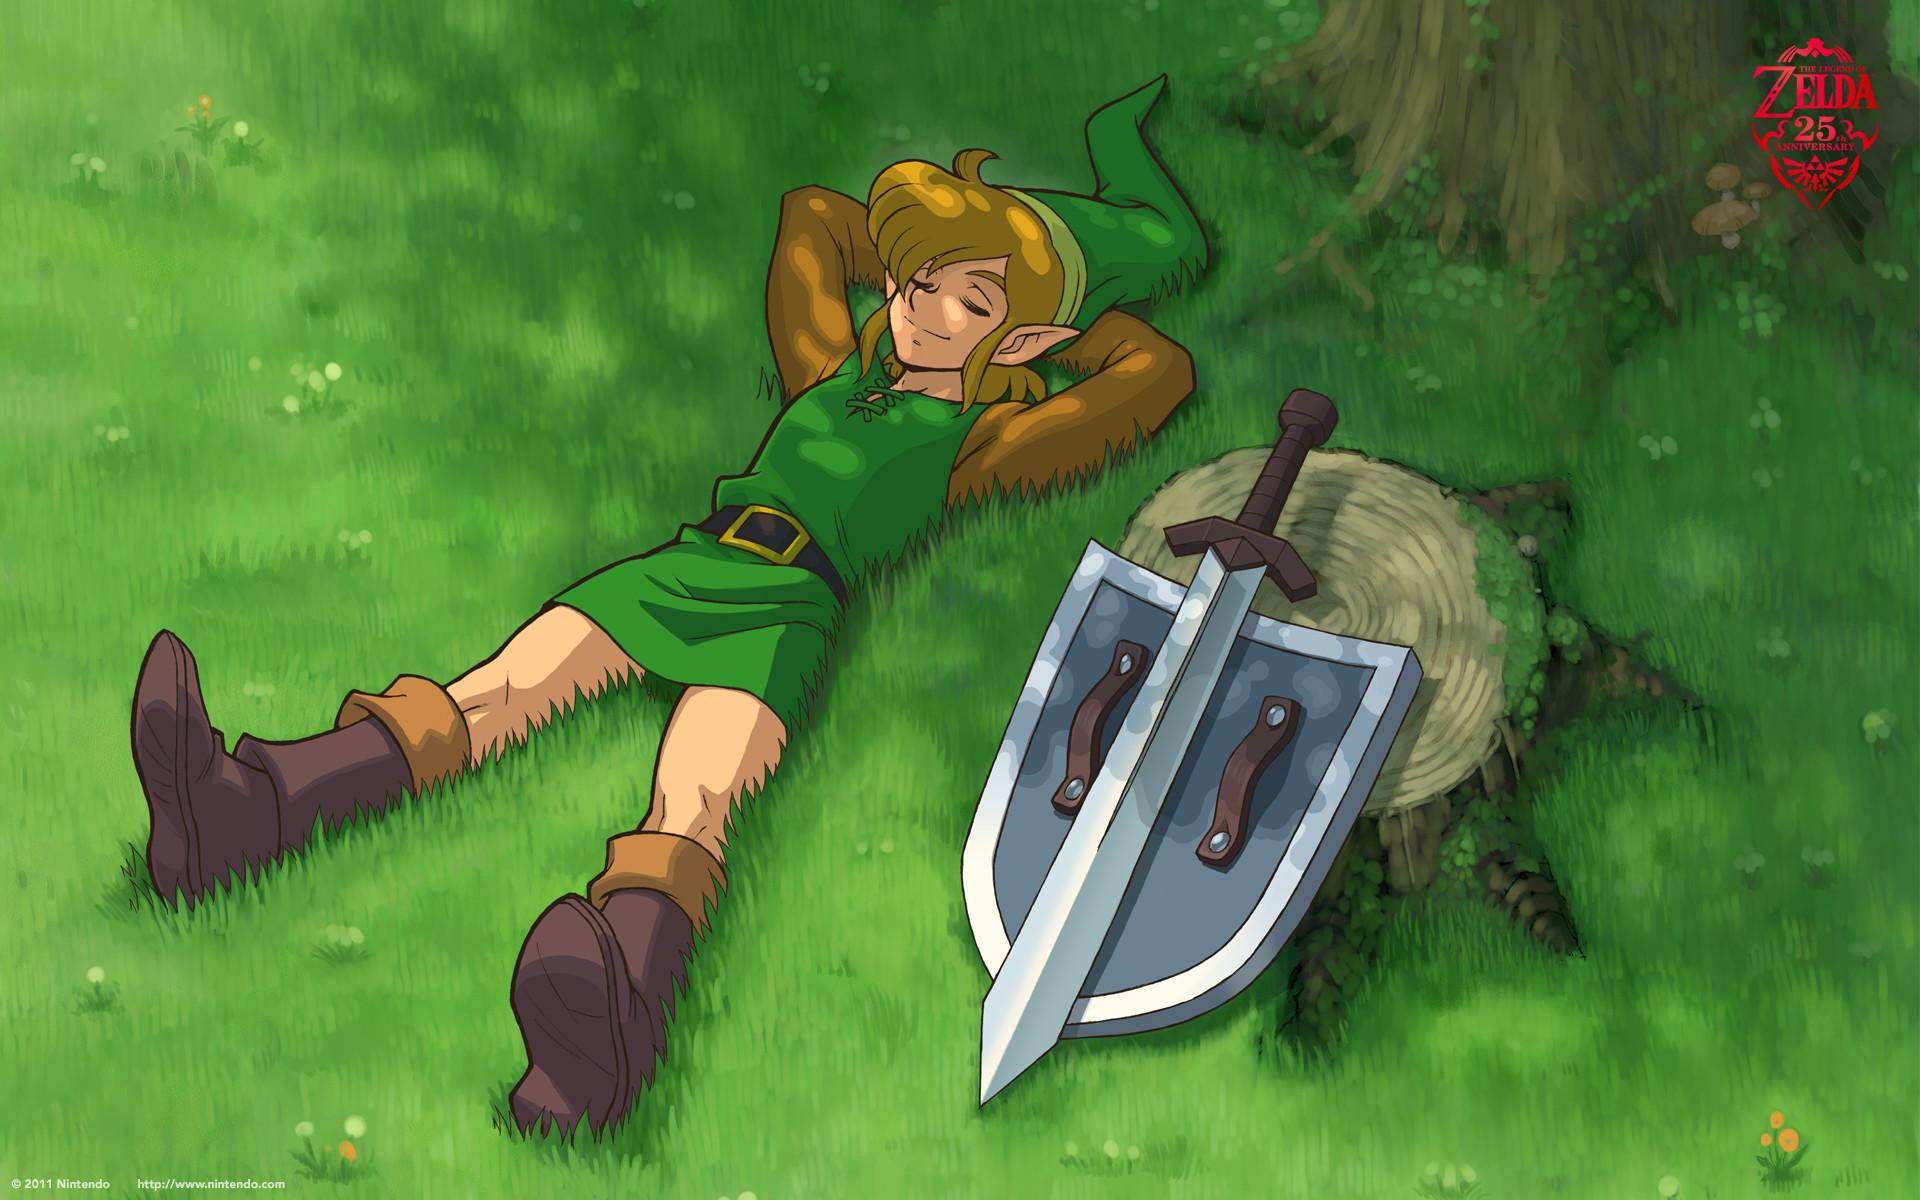 25th anniversary wallpapers – The Legend of Zelda Wallpaper (24924906 .